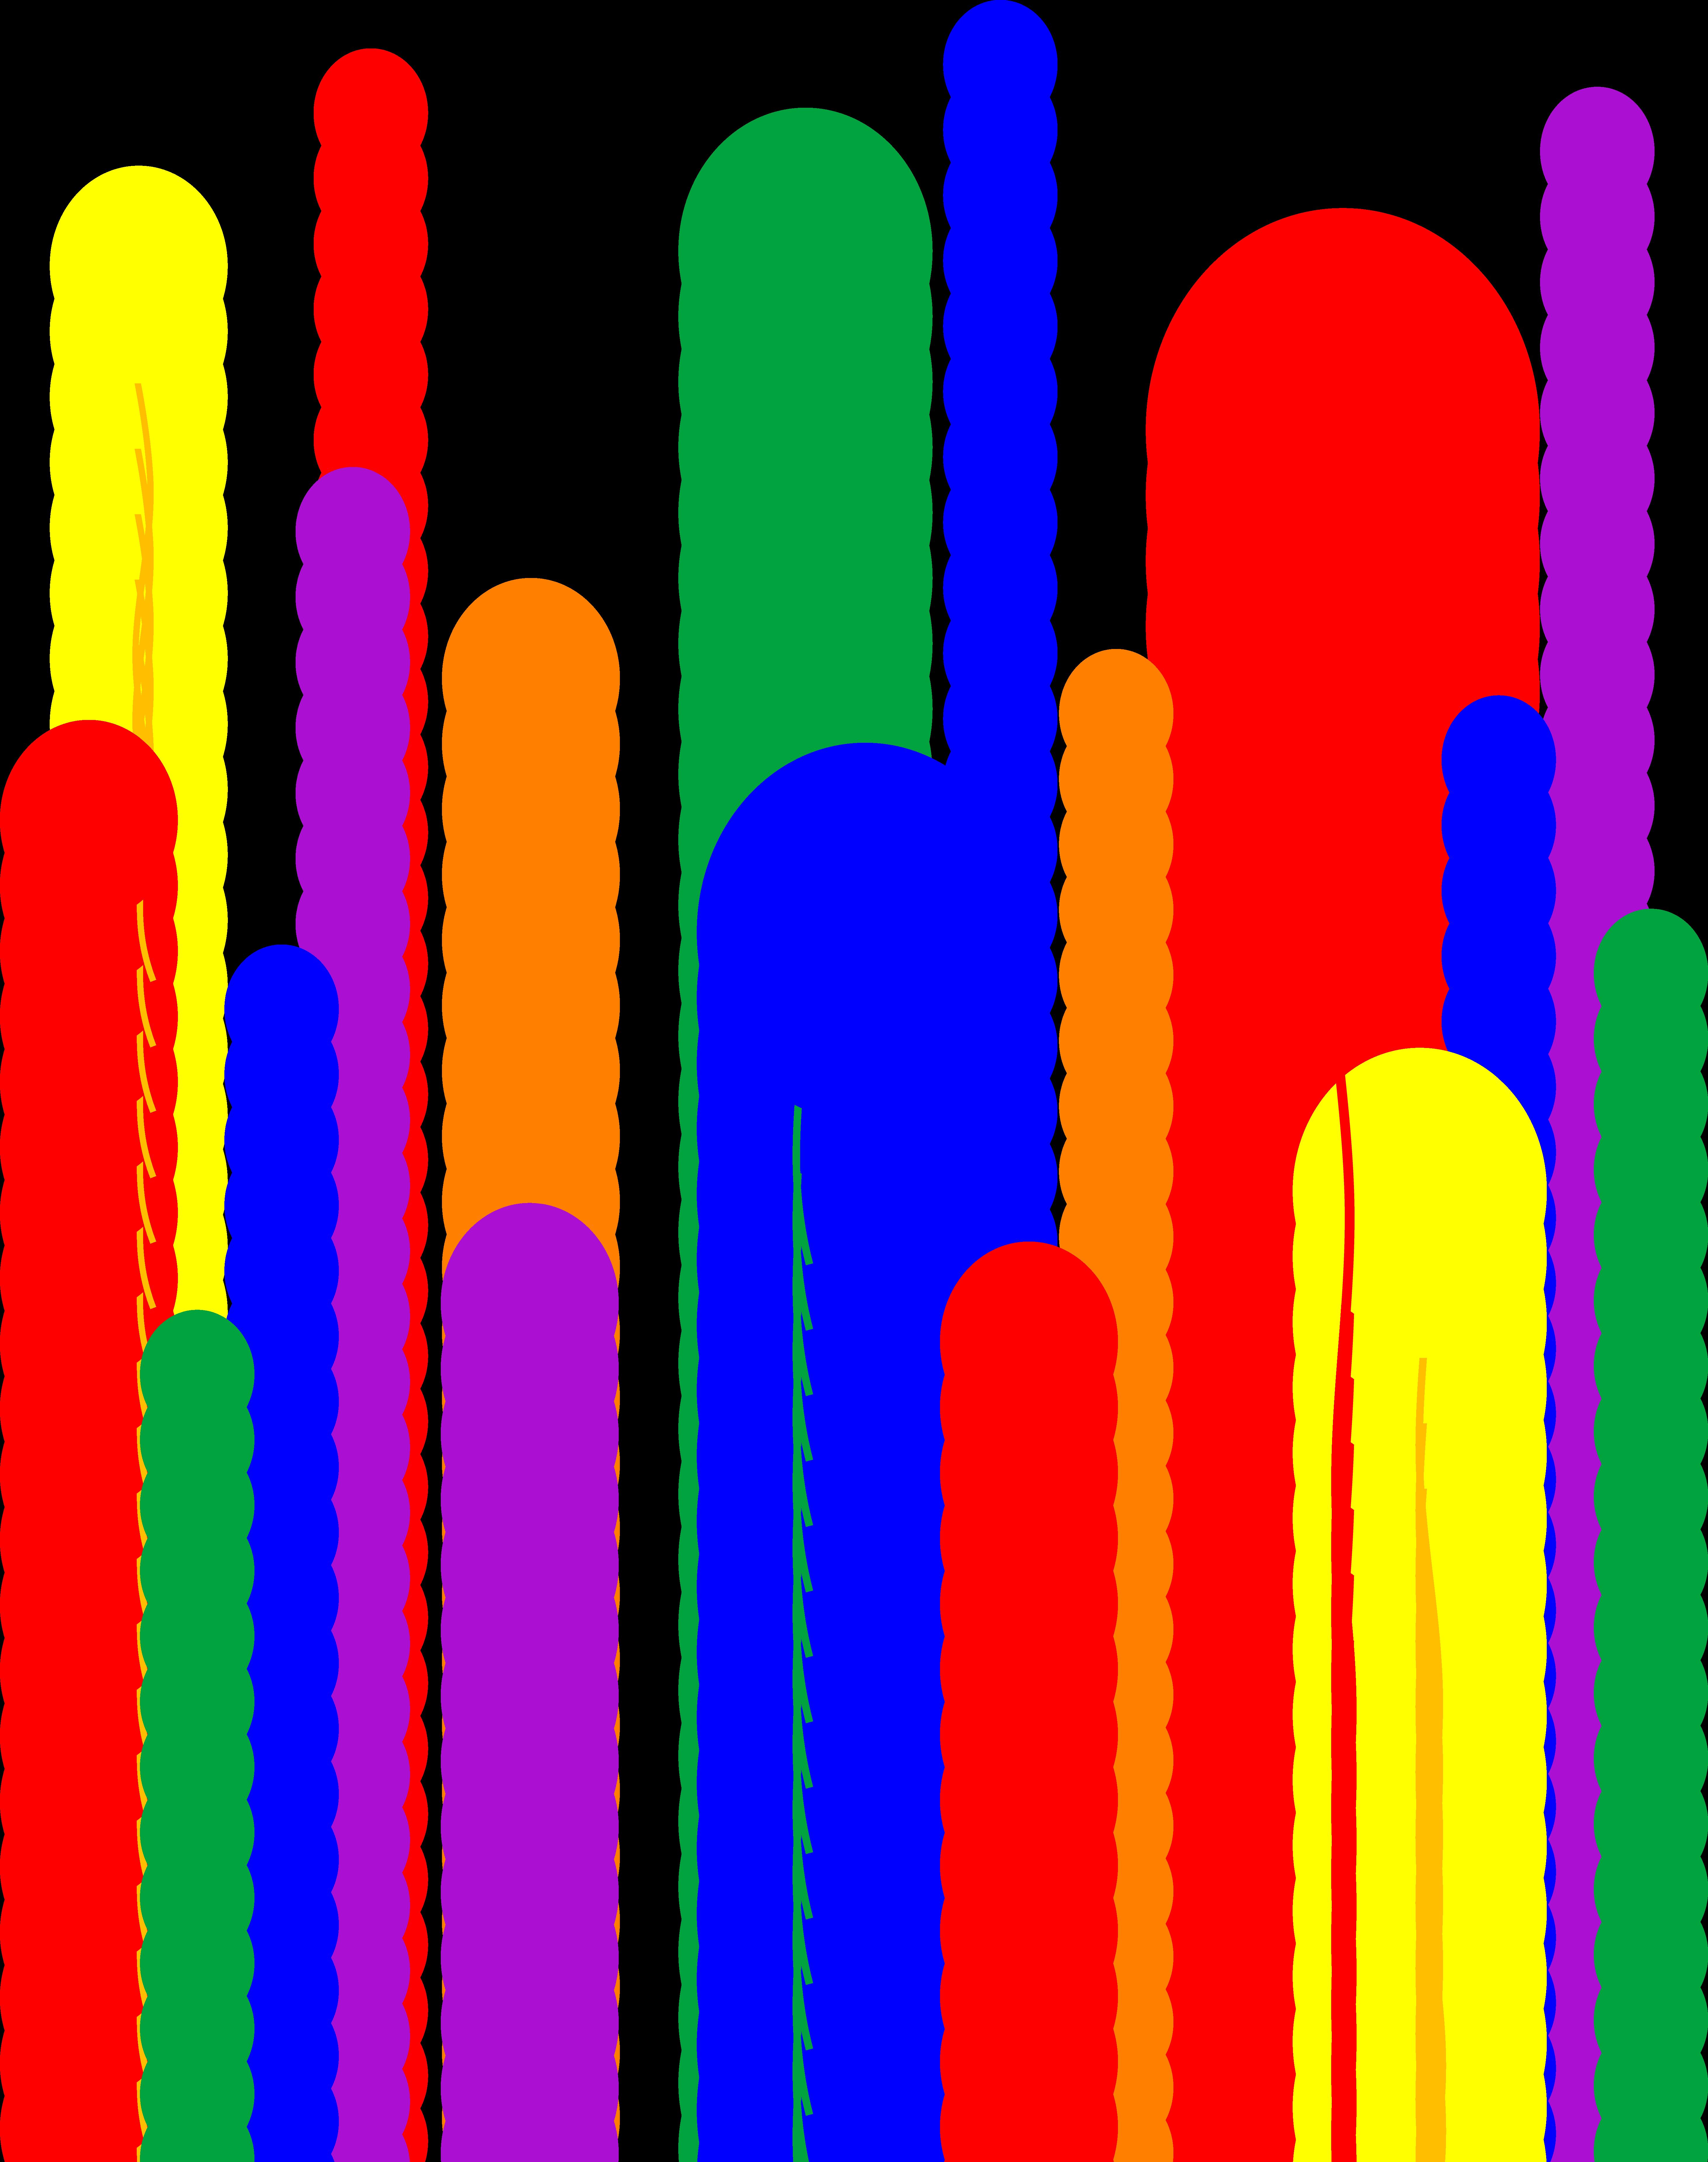 Simple Colorful Birthday .-Simple Colorful Birthday .-5